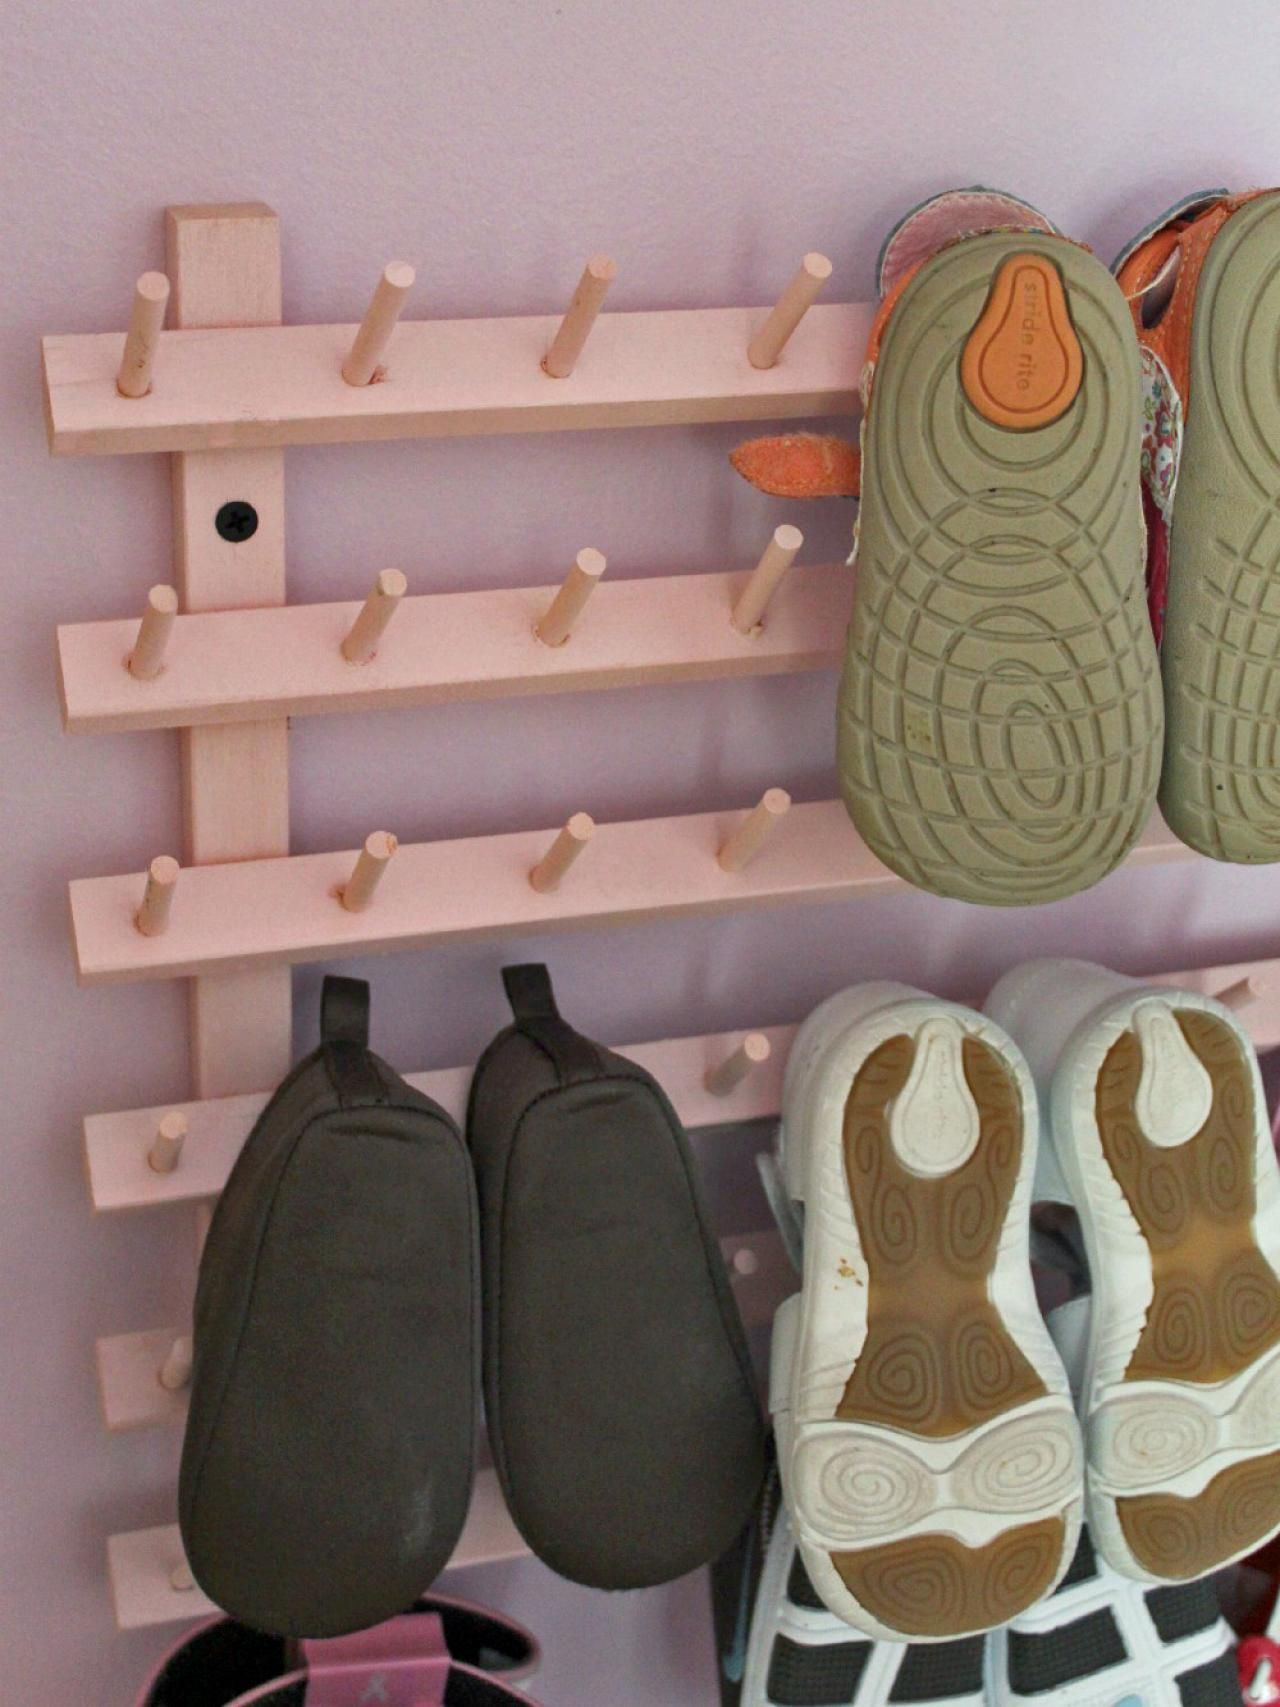 Laundry Room Shoe Storage. Http://www.hgtv.com/design